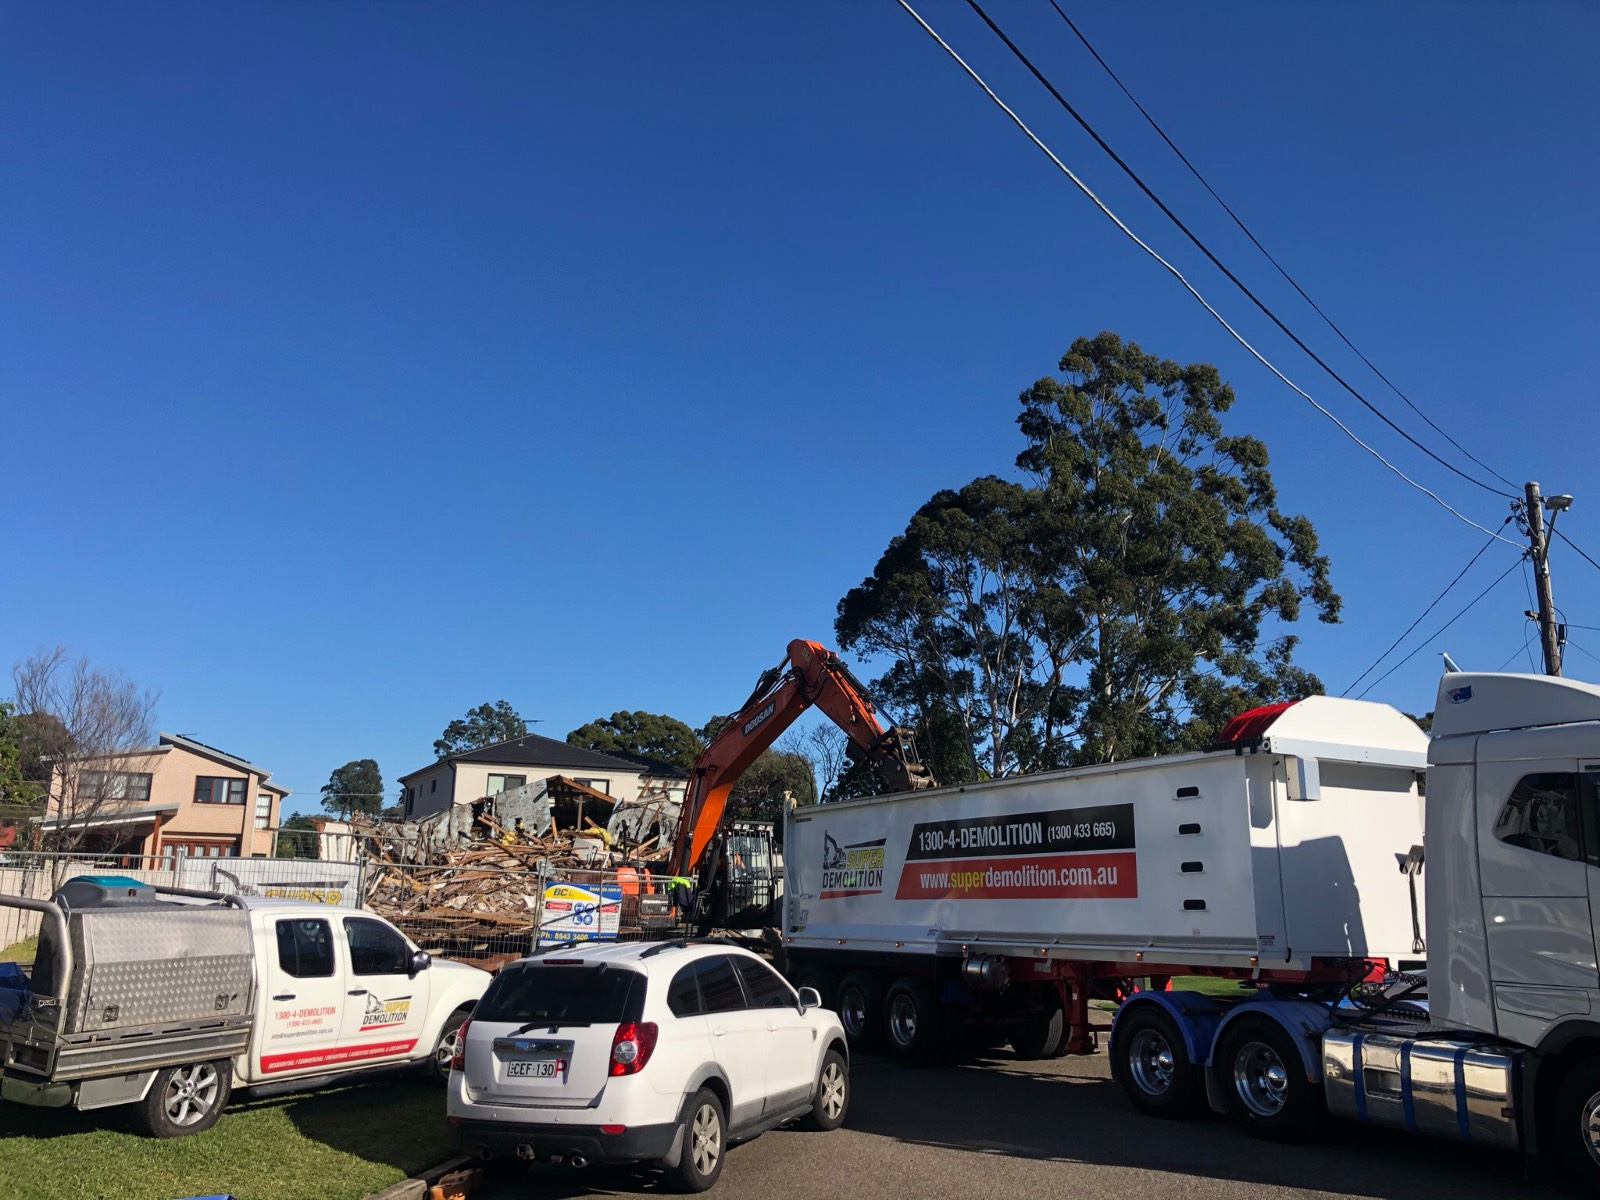 Super Demolition